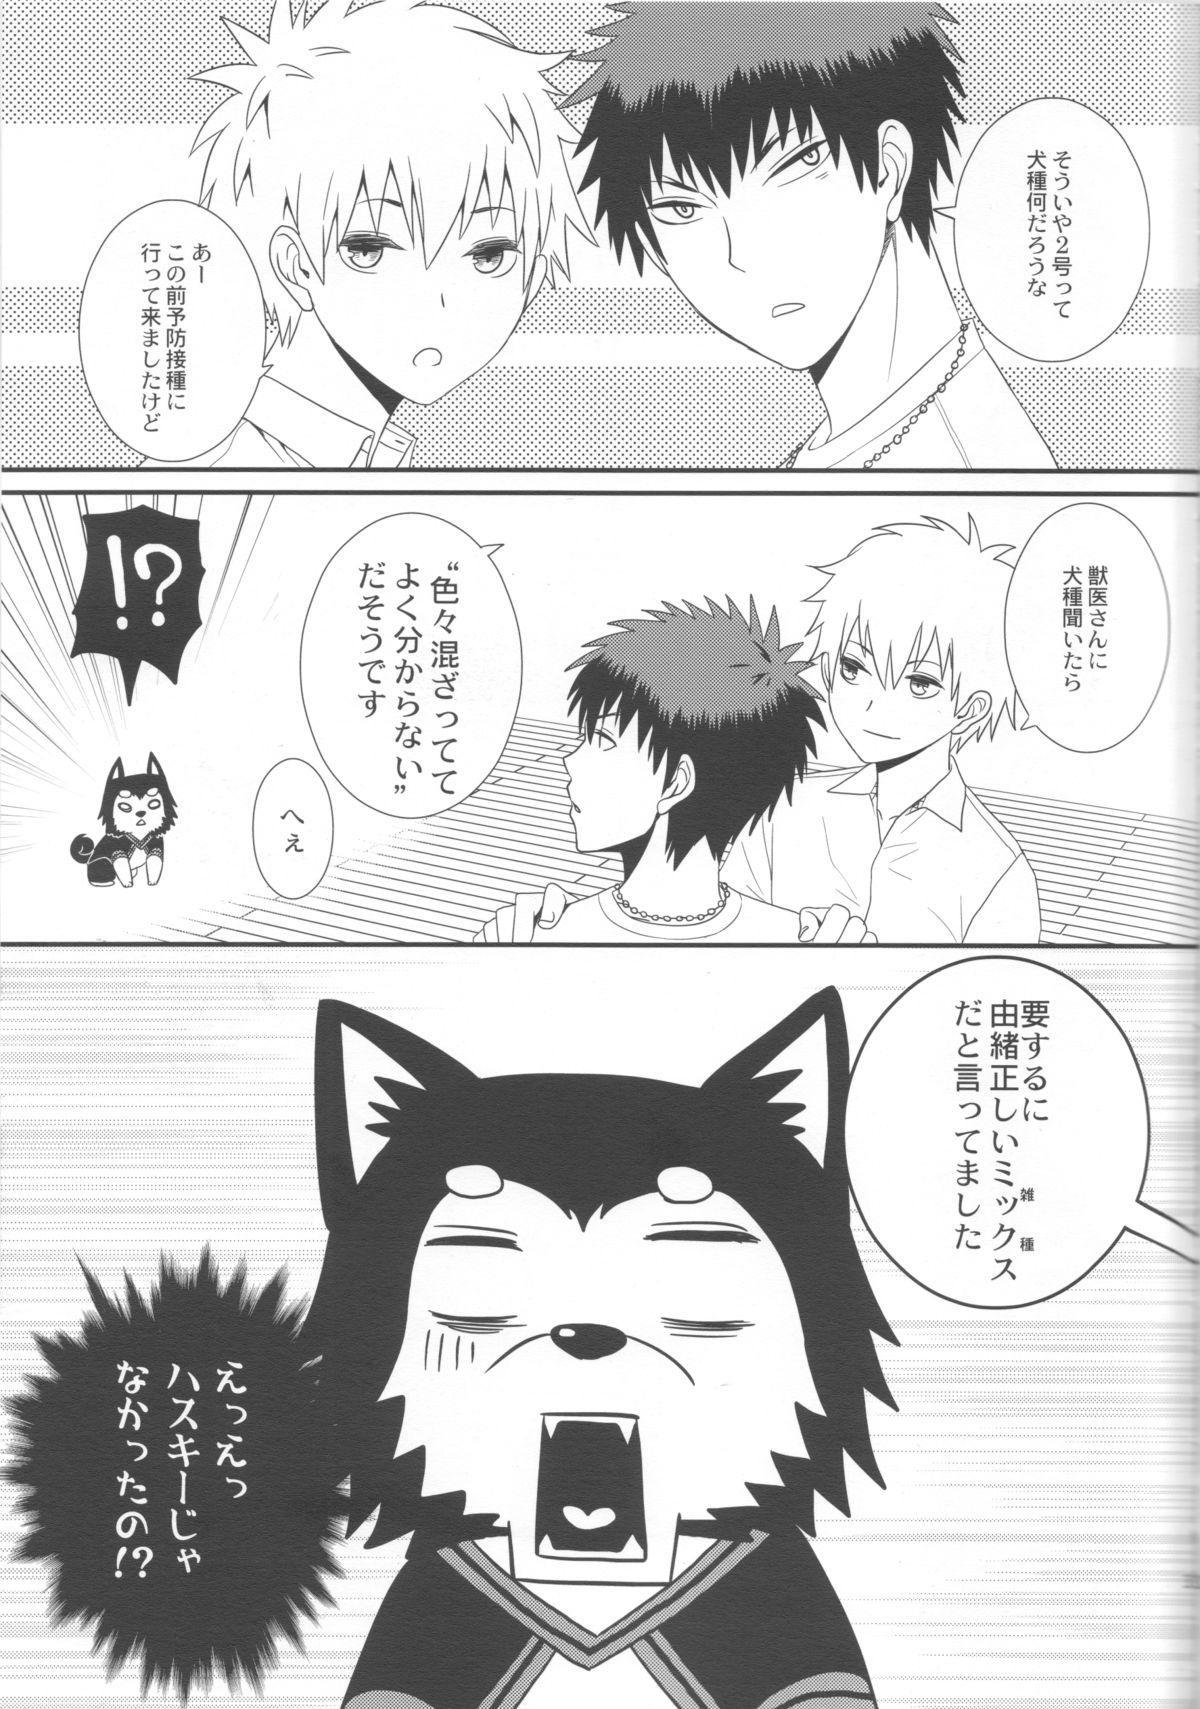 Kuroko to Kagami to Tokidoki Nigou to 31